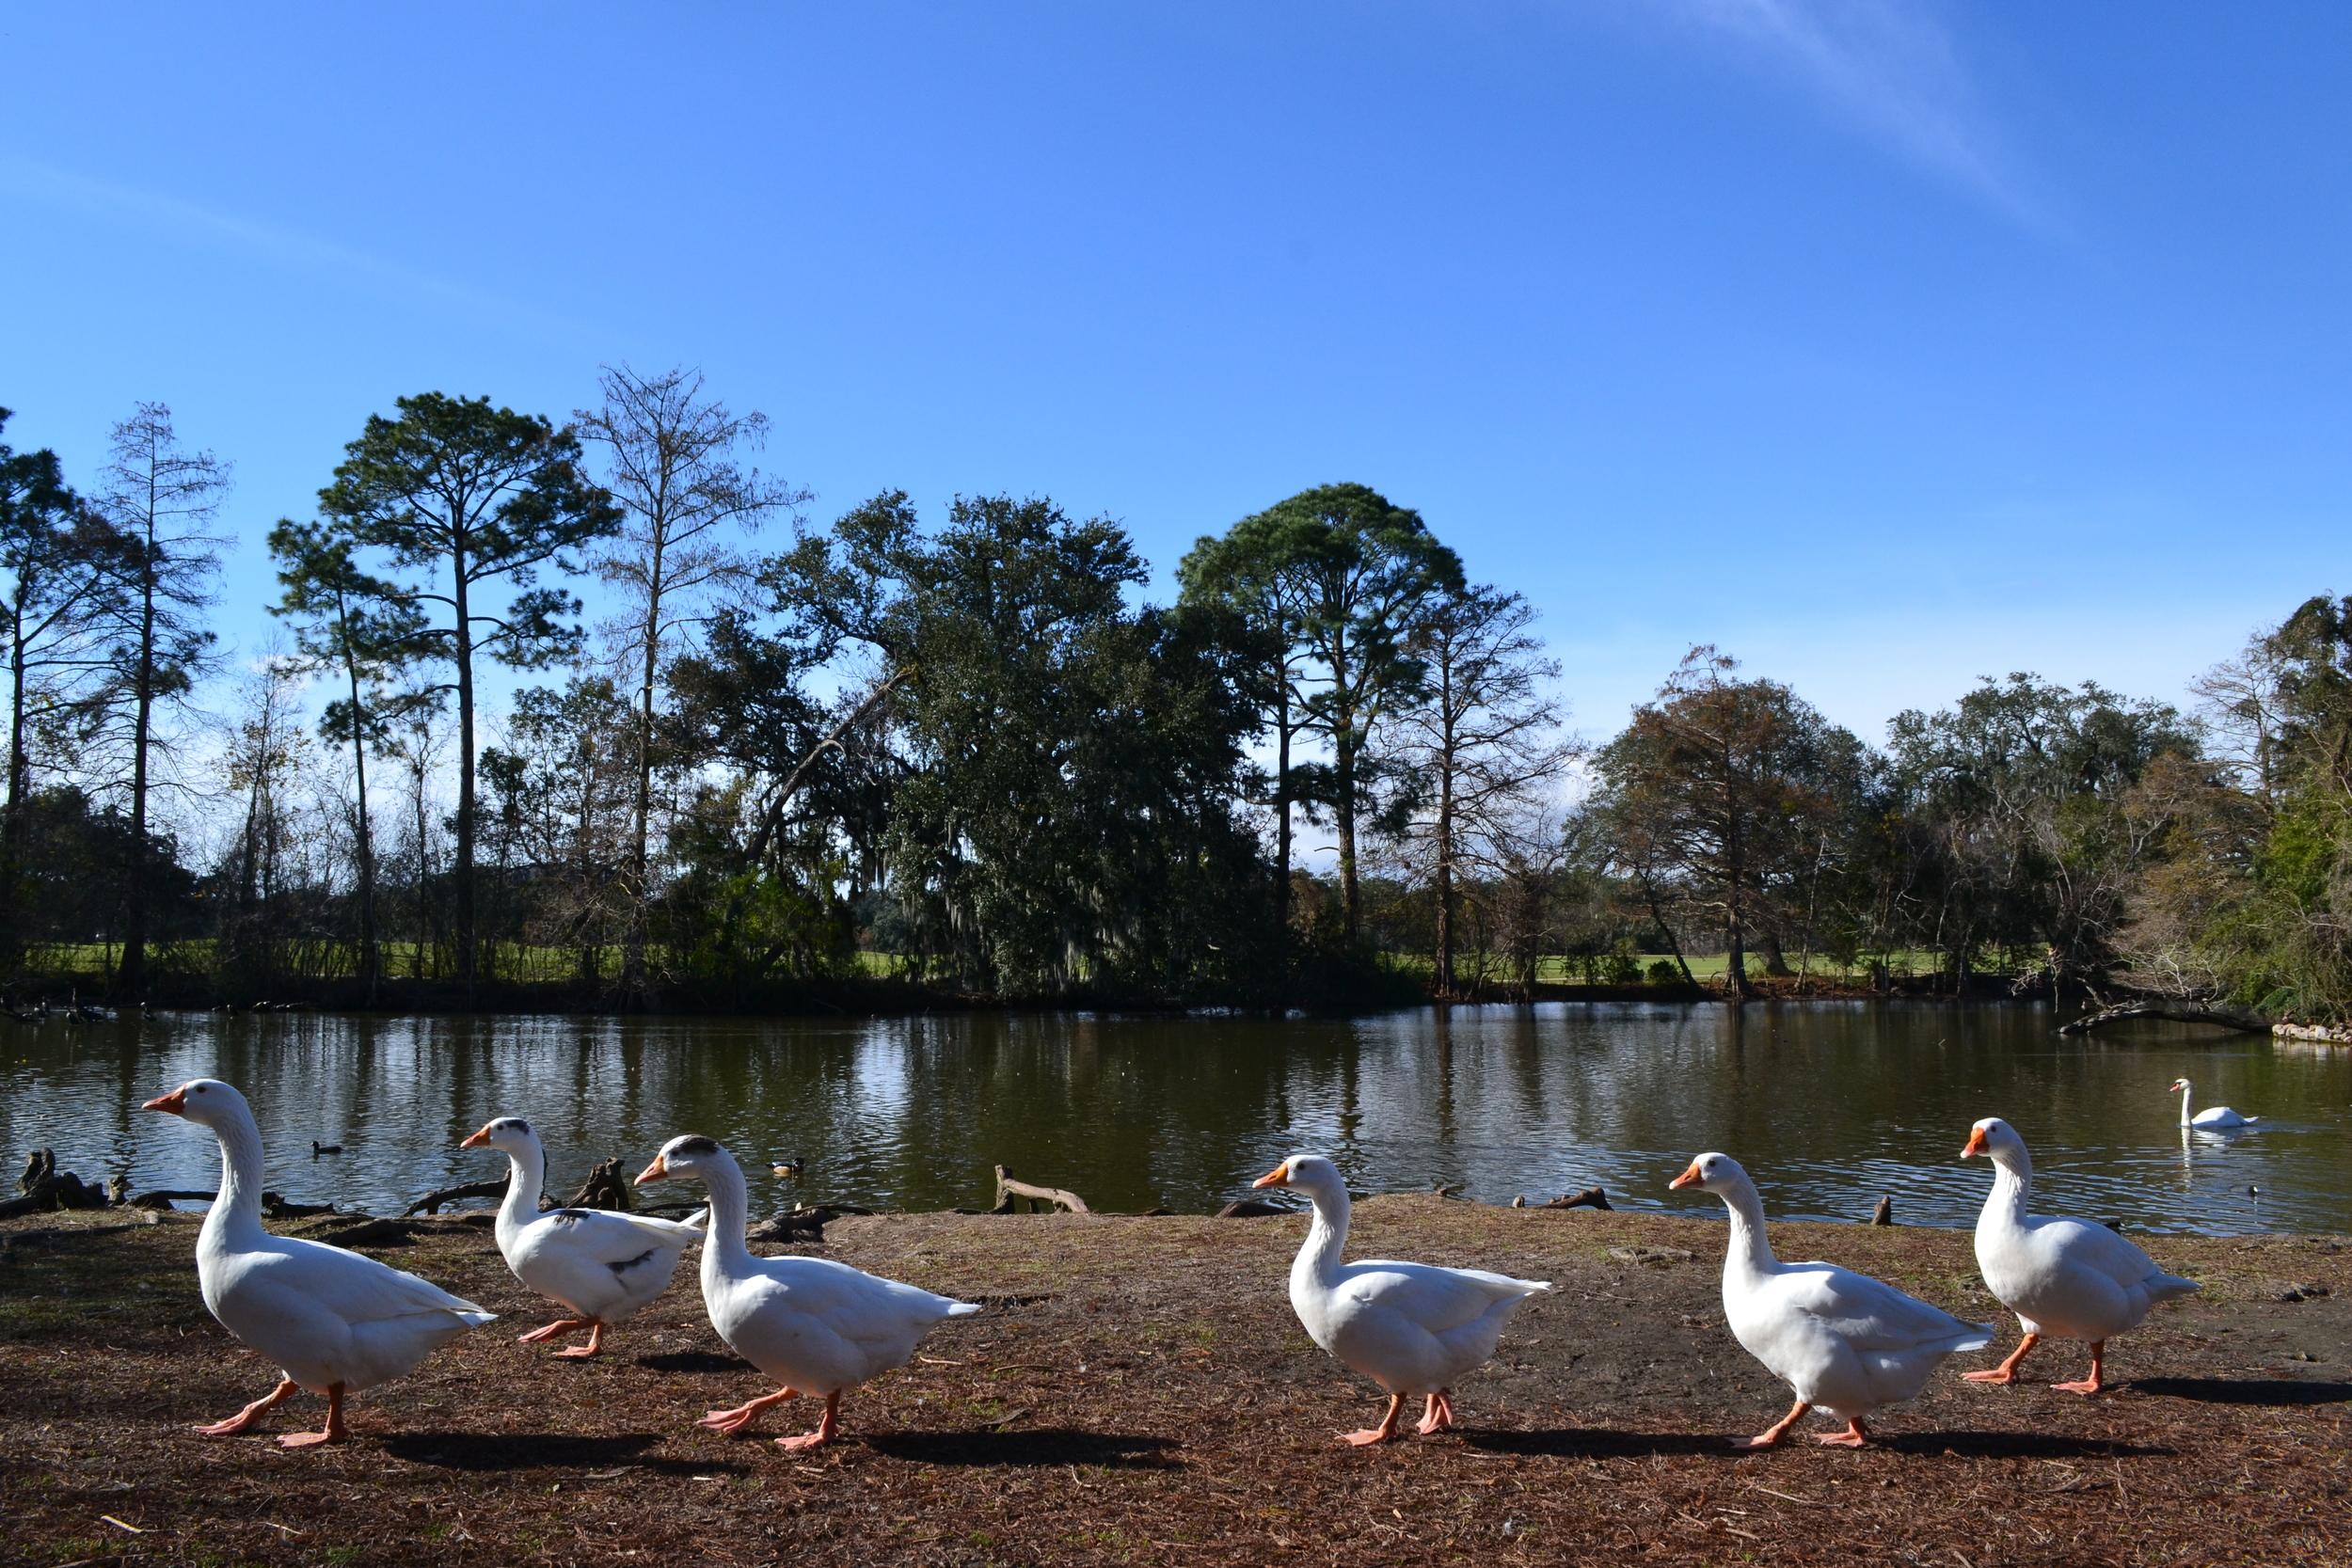 More ducks at Audubon Park.